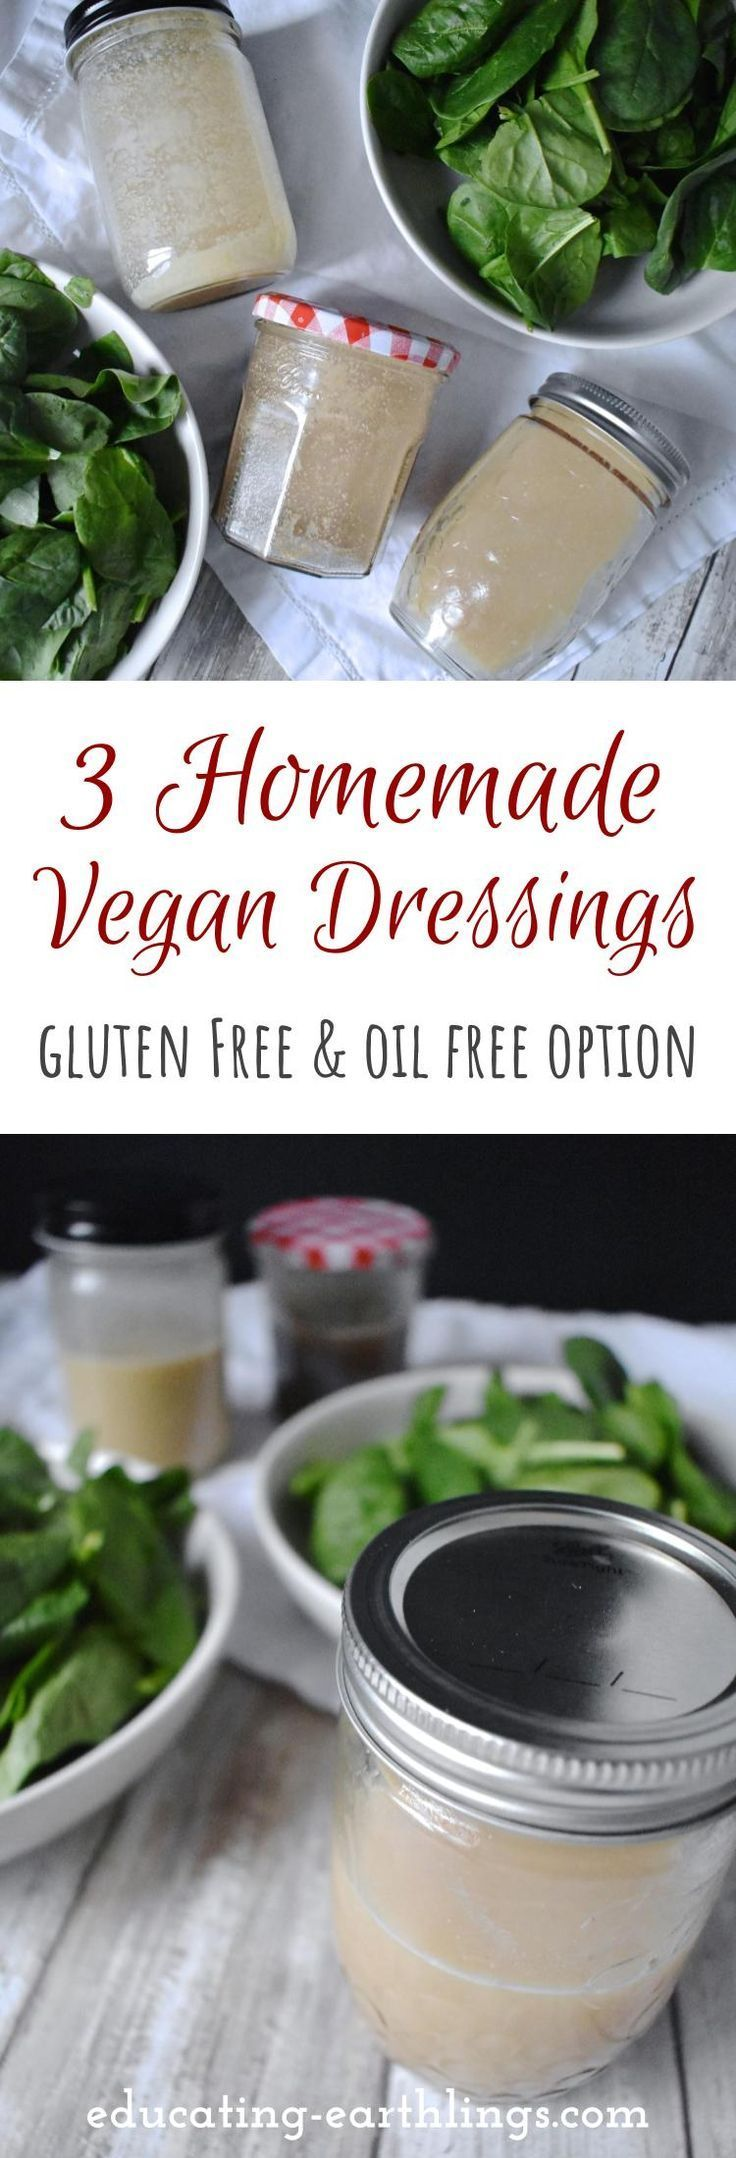 3 Simple Homemade Vegan Salad Dressings Food recipes